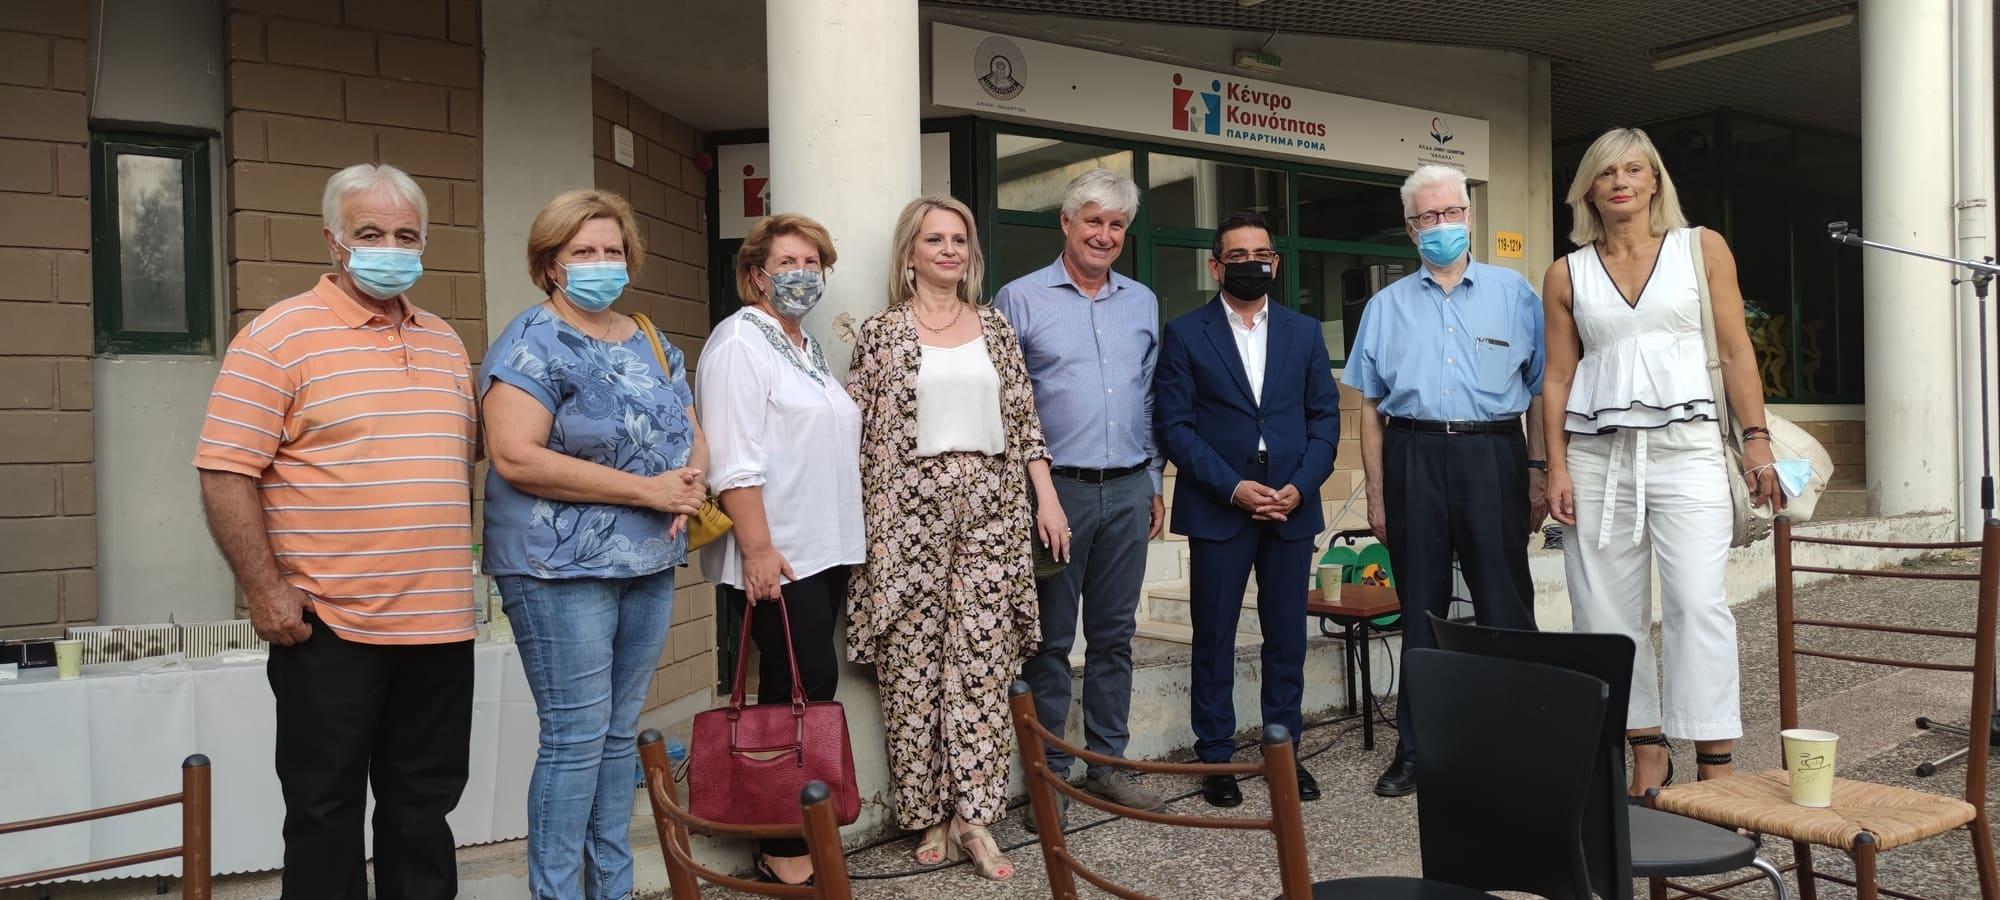 EpirusPost • Ειδήσεις, Ιωάννινα, Άρτα, Πρέβεζα, Θεσπρωτία • kk